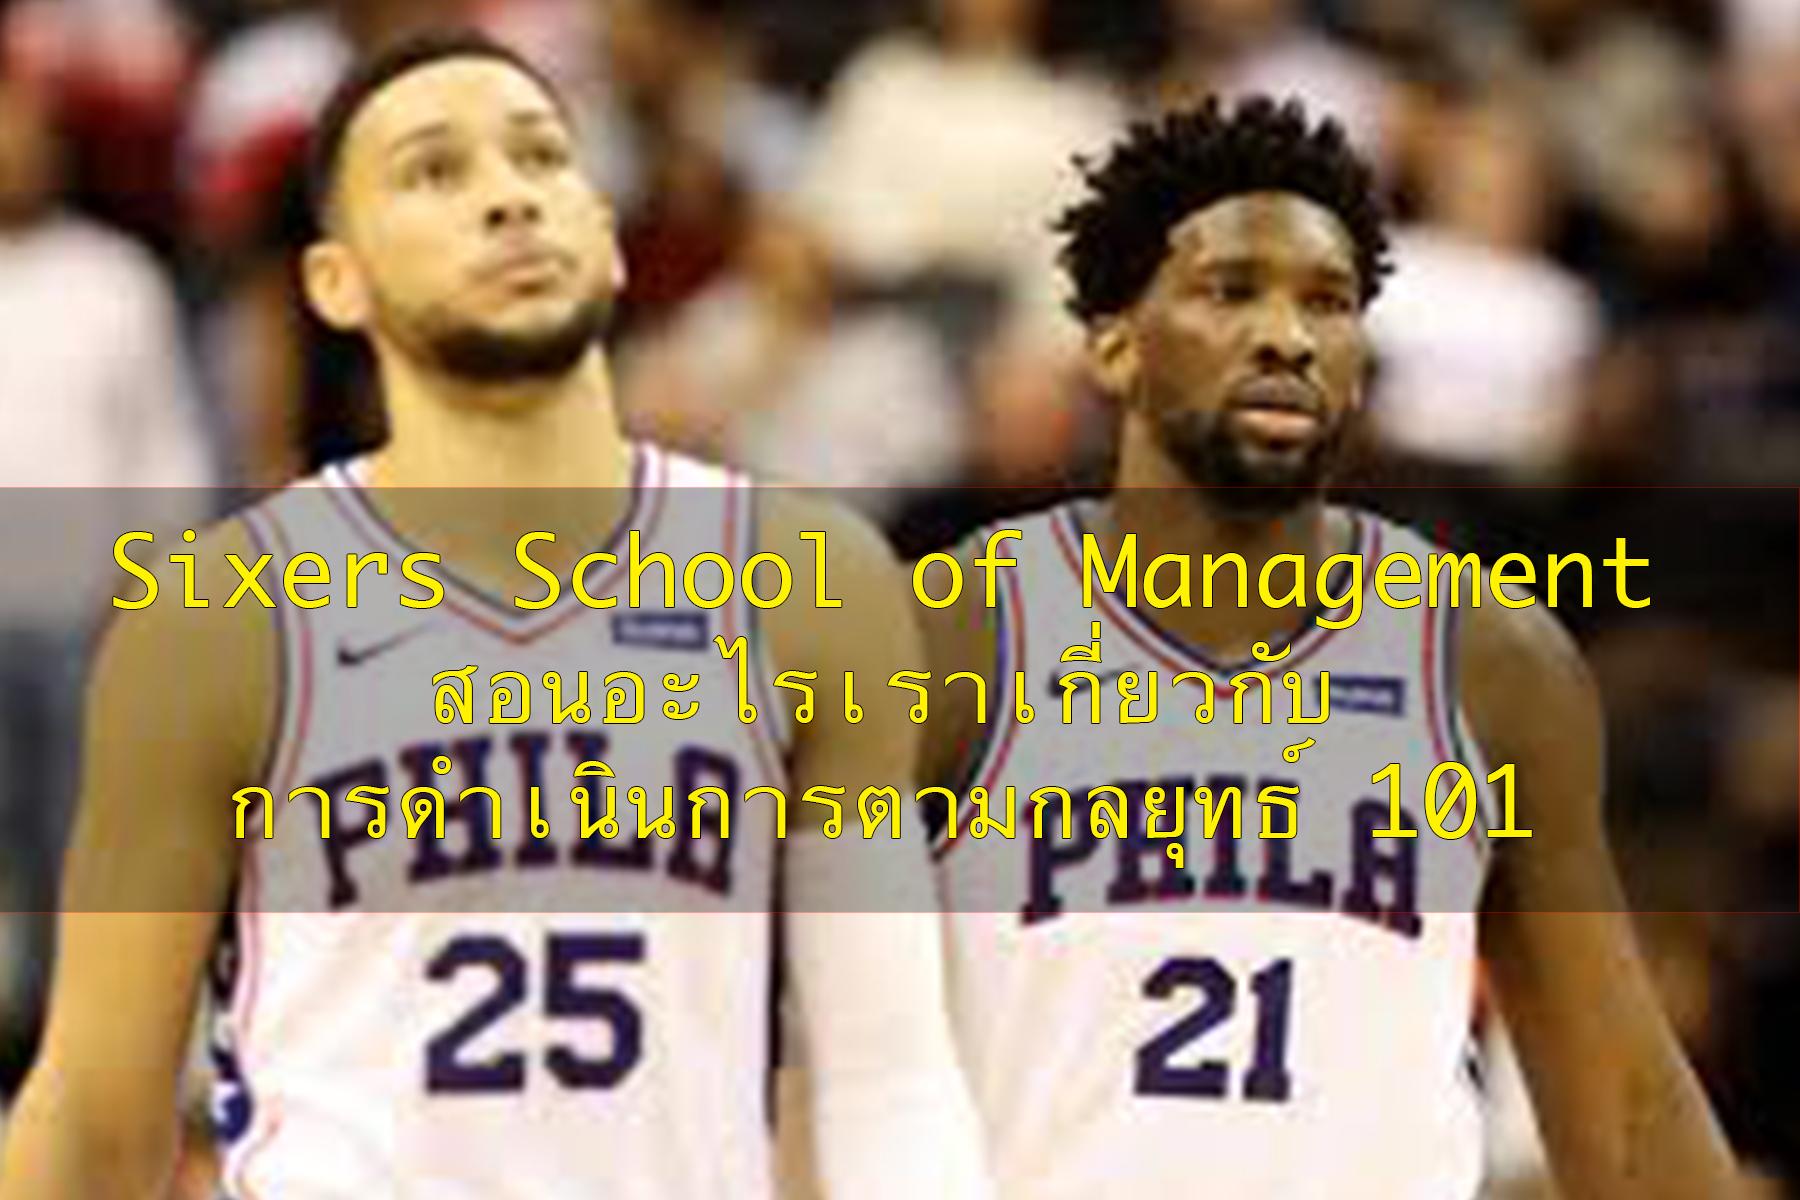 Sixers School of Management สอนอะไรเราเกี่ยวกับการดำเนินการตามกลยุทธ์ 101